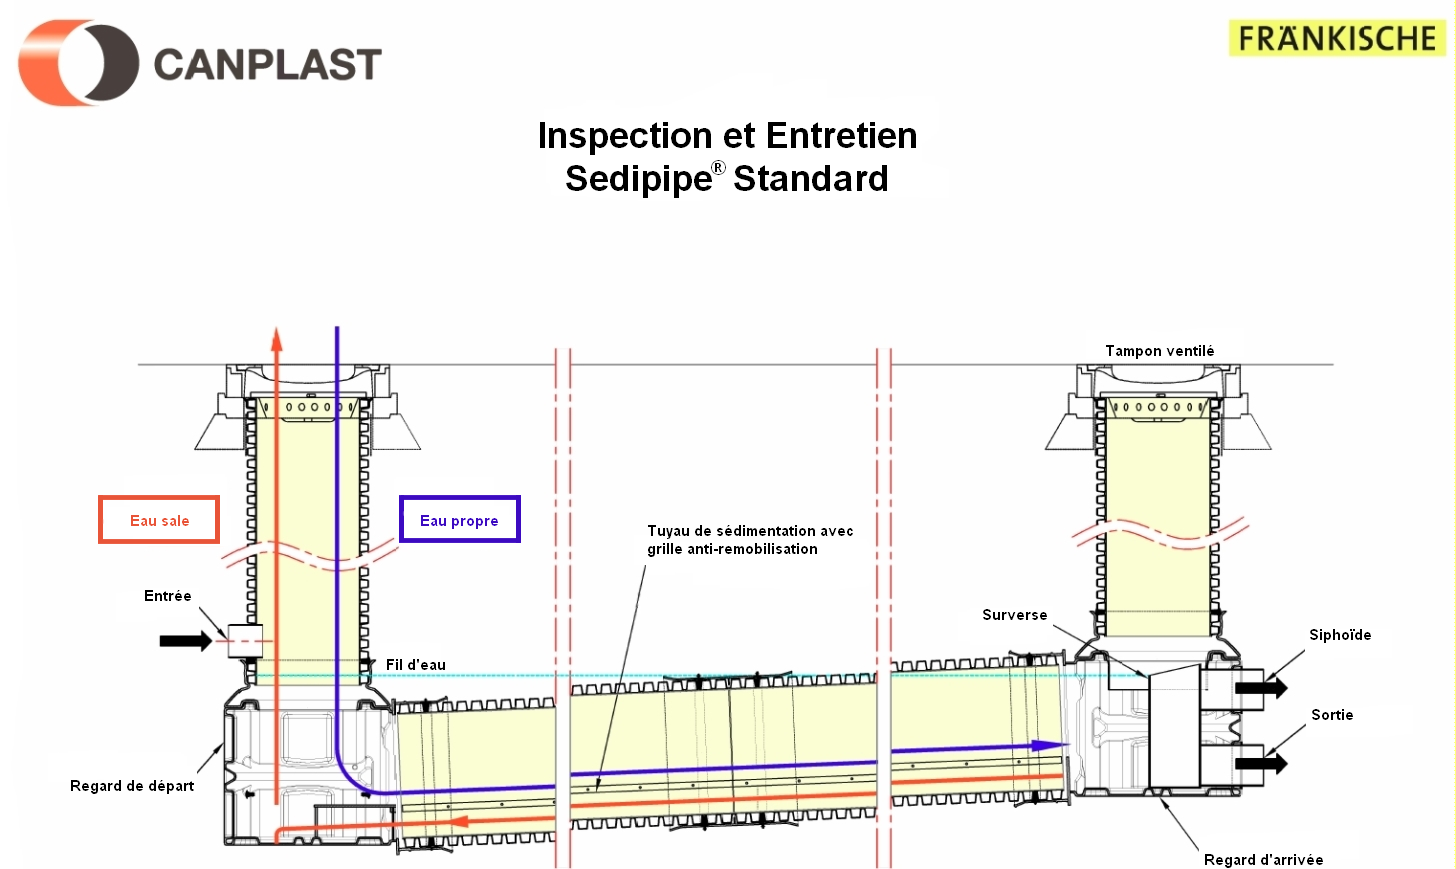 SediPipe Standard